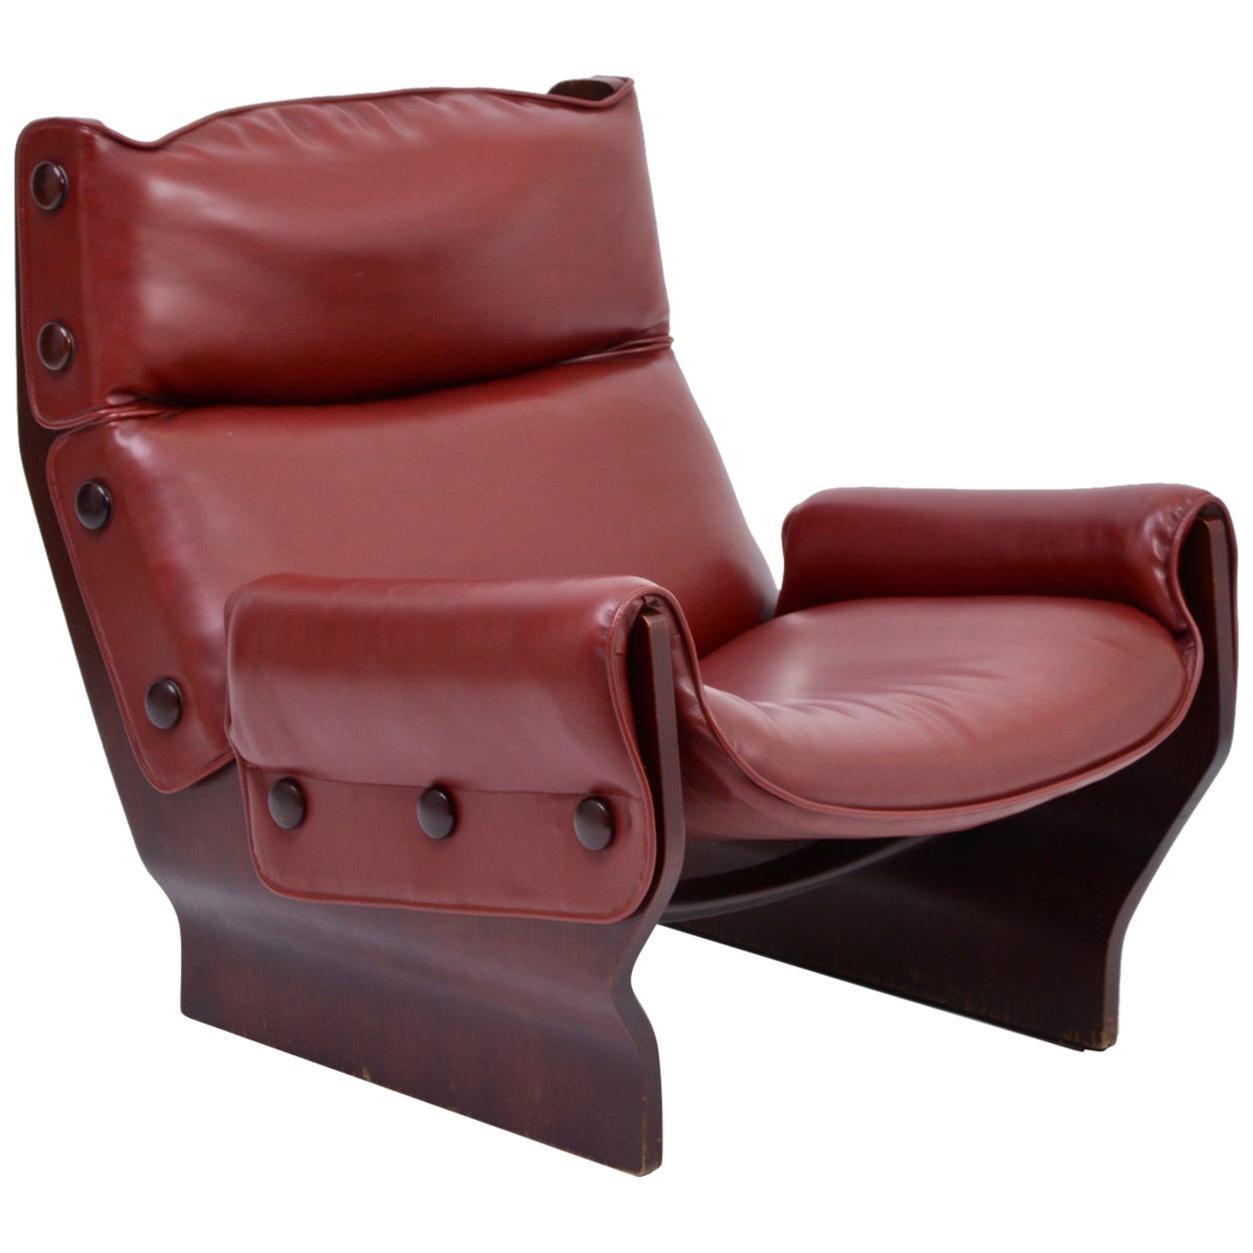 Mid-Century Modern P110 'Canada' Lounge Chair by Osvaldo Borsani for Tecno